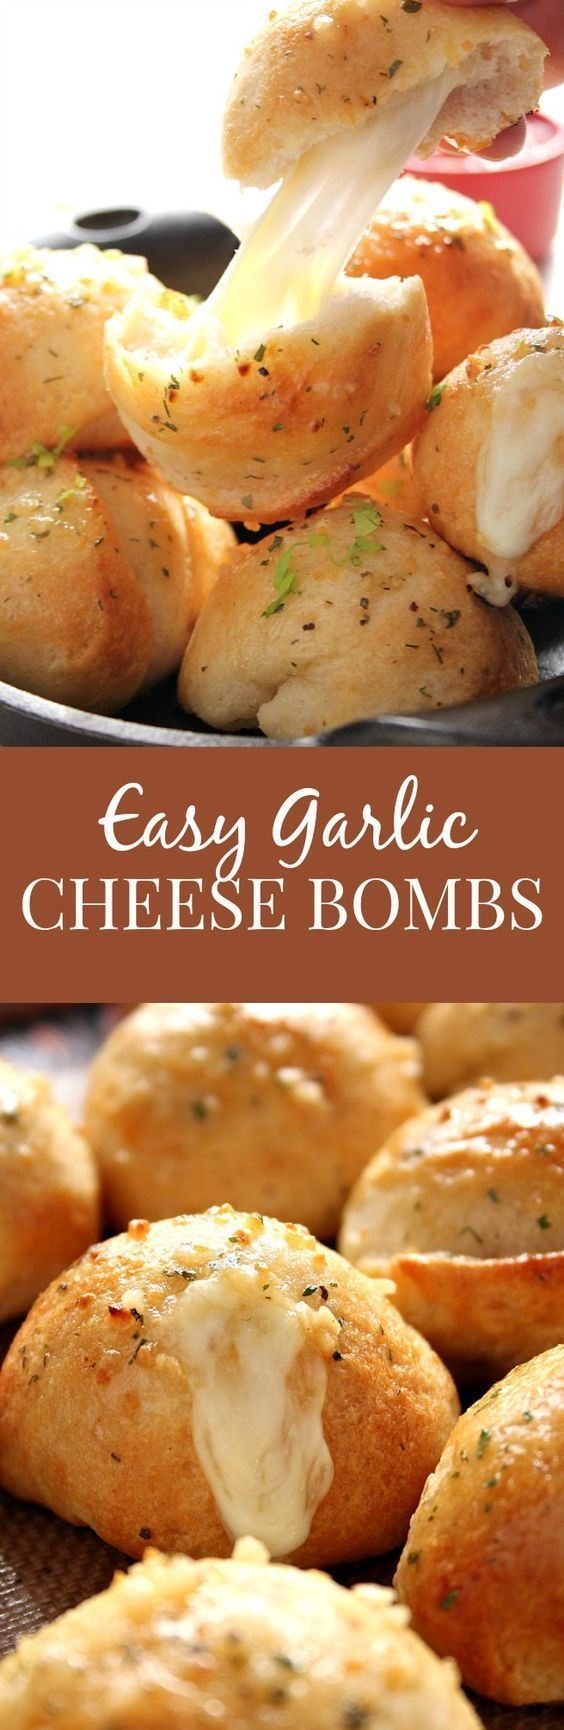 Easy Garlic Cheese Bombs